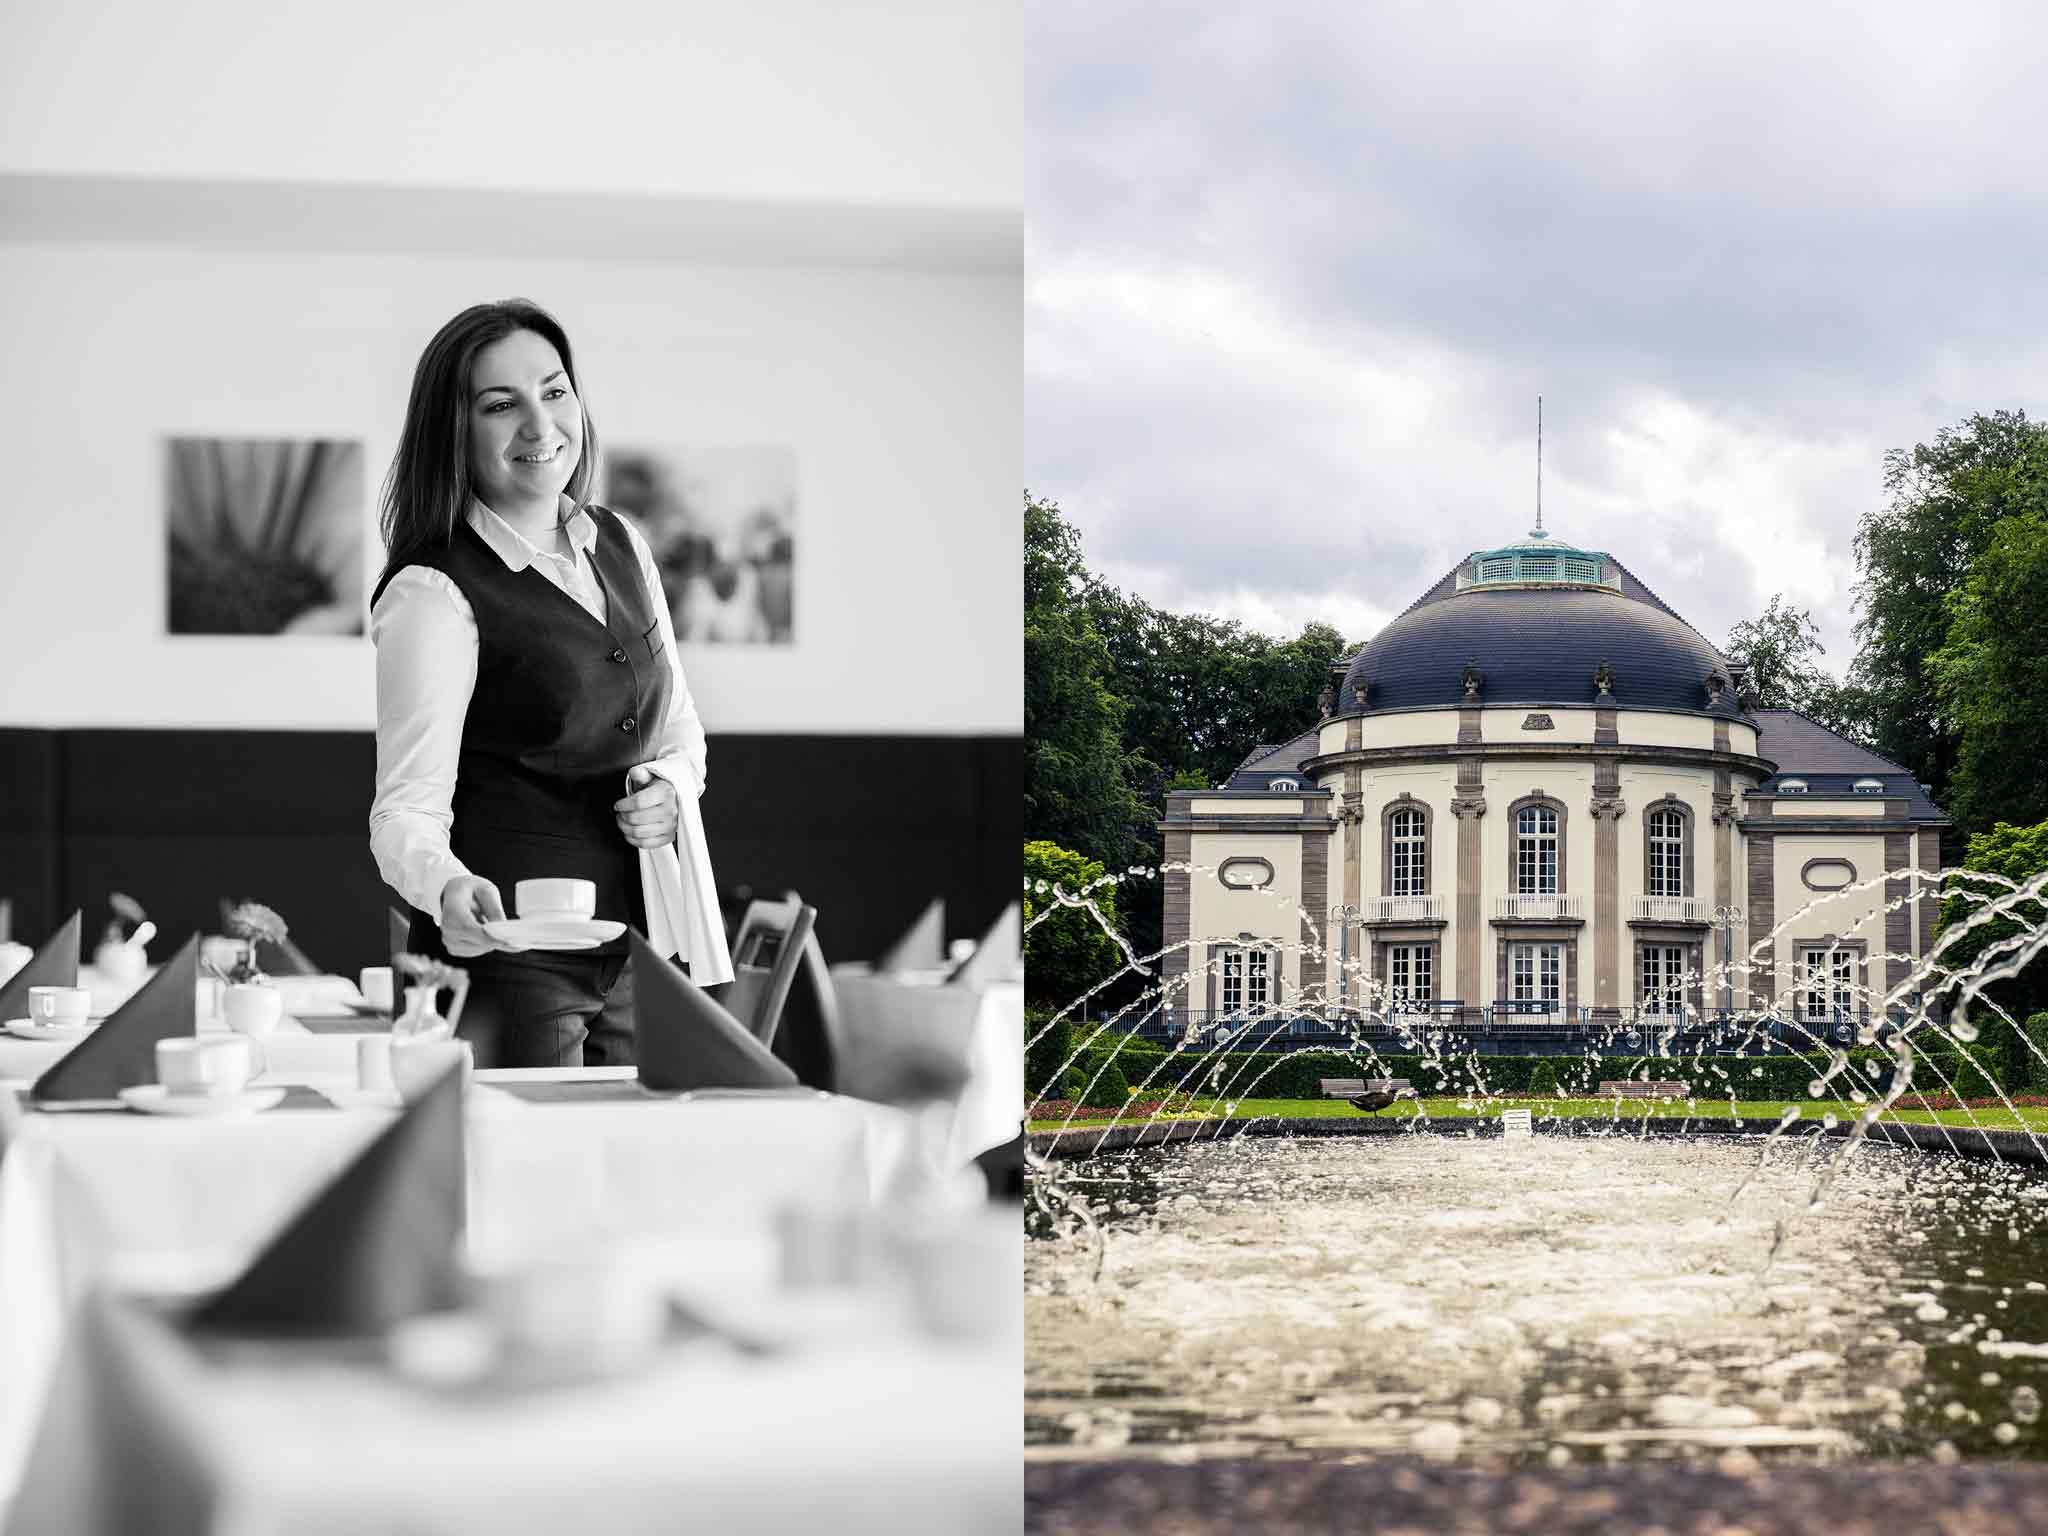 Mercure Hotel Bad Oeynhausen City Relaxation centre